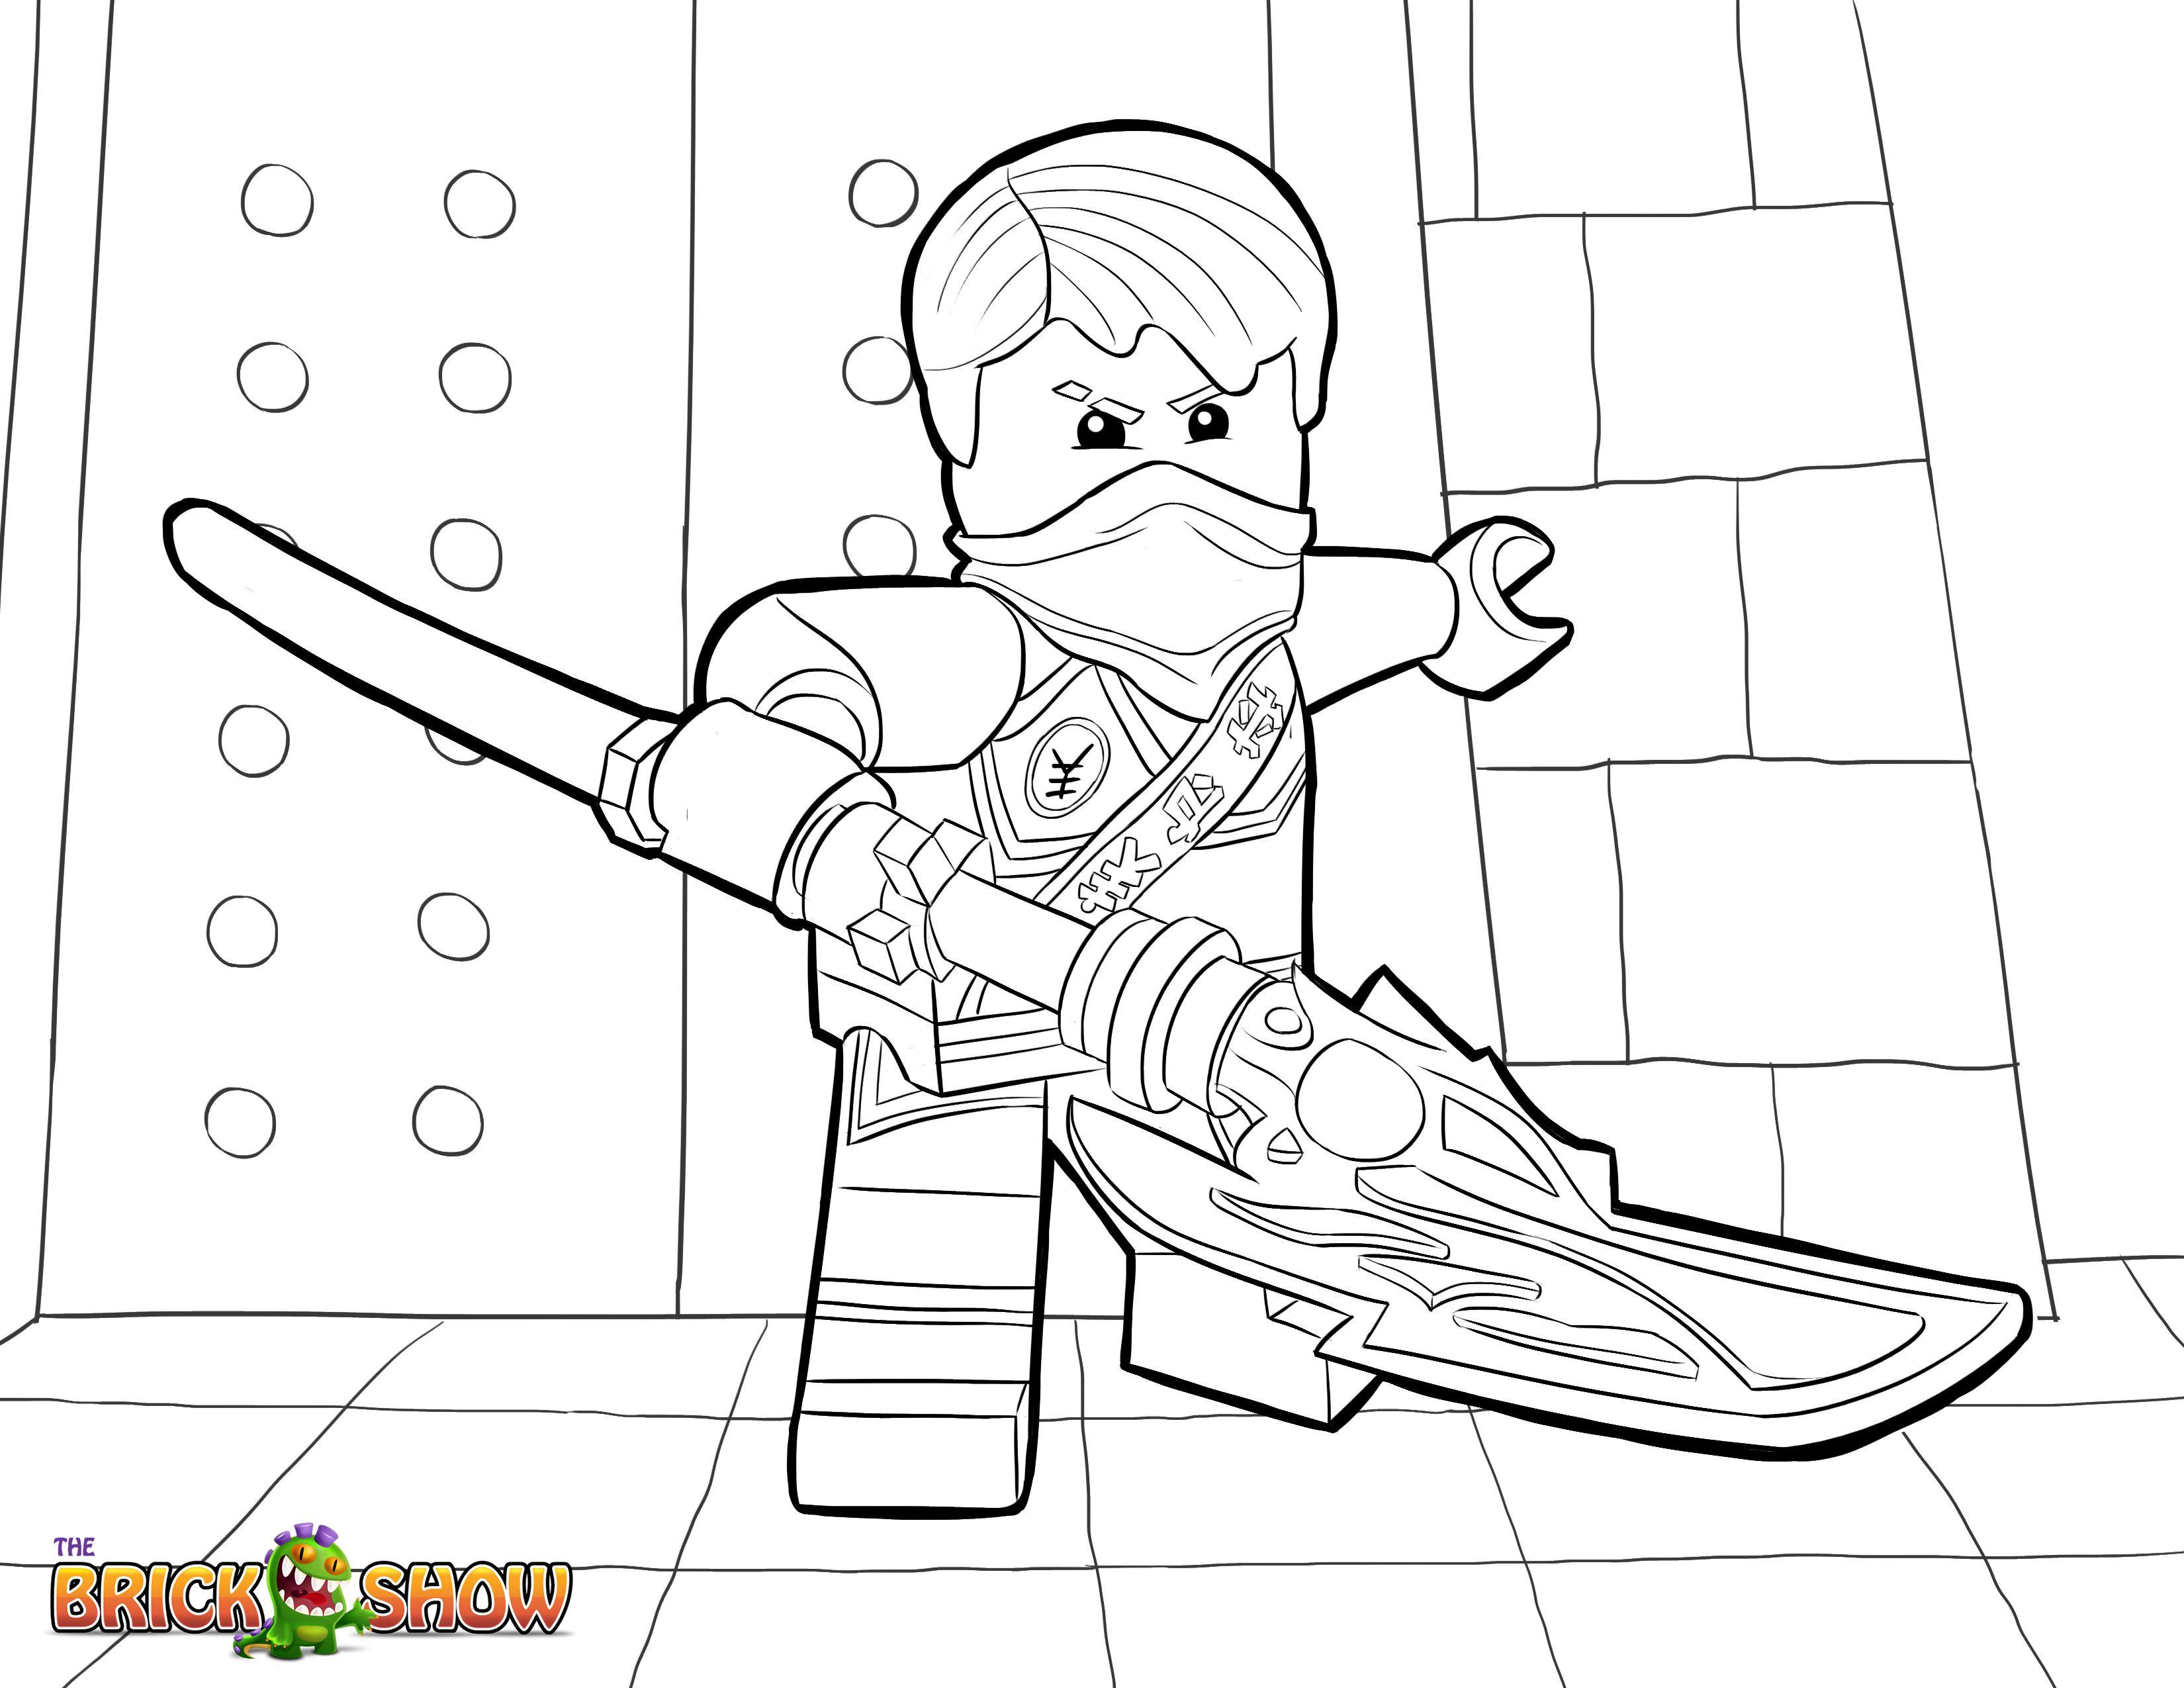 LEGO Ninjago Coloring Page, LEGO LEGO Ninjago Jay